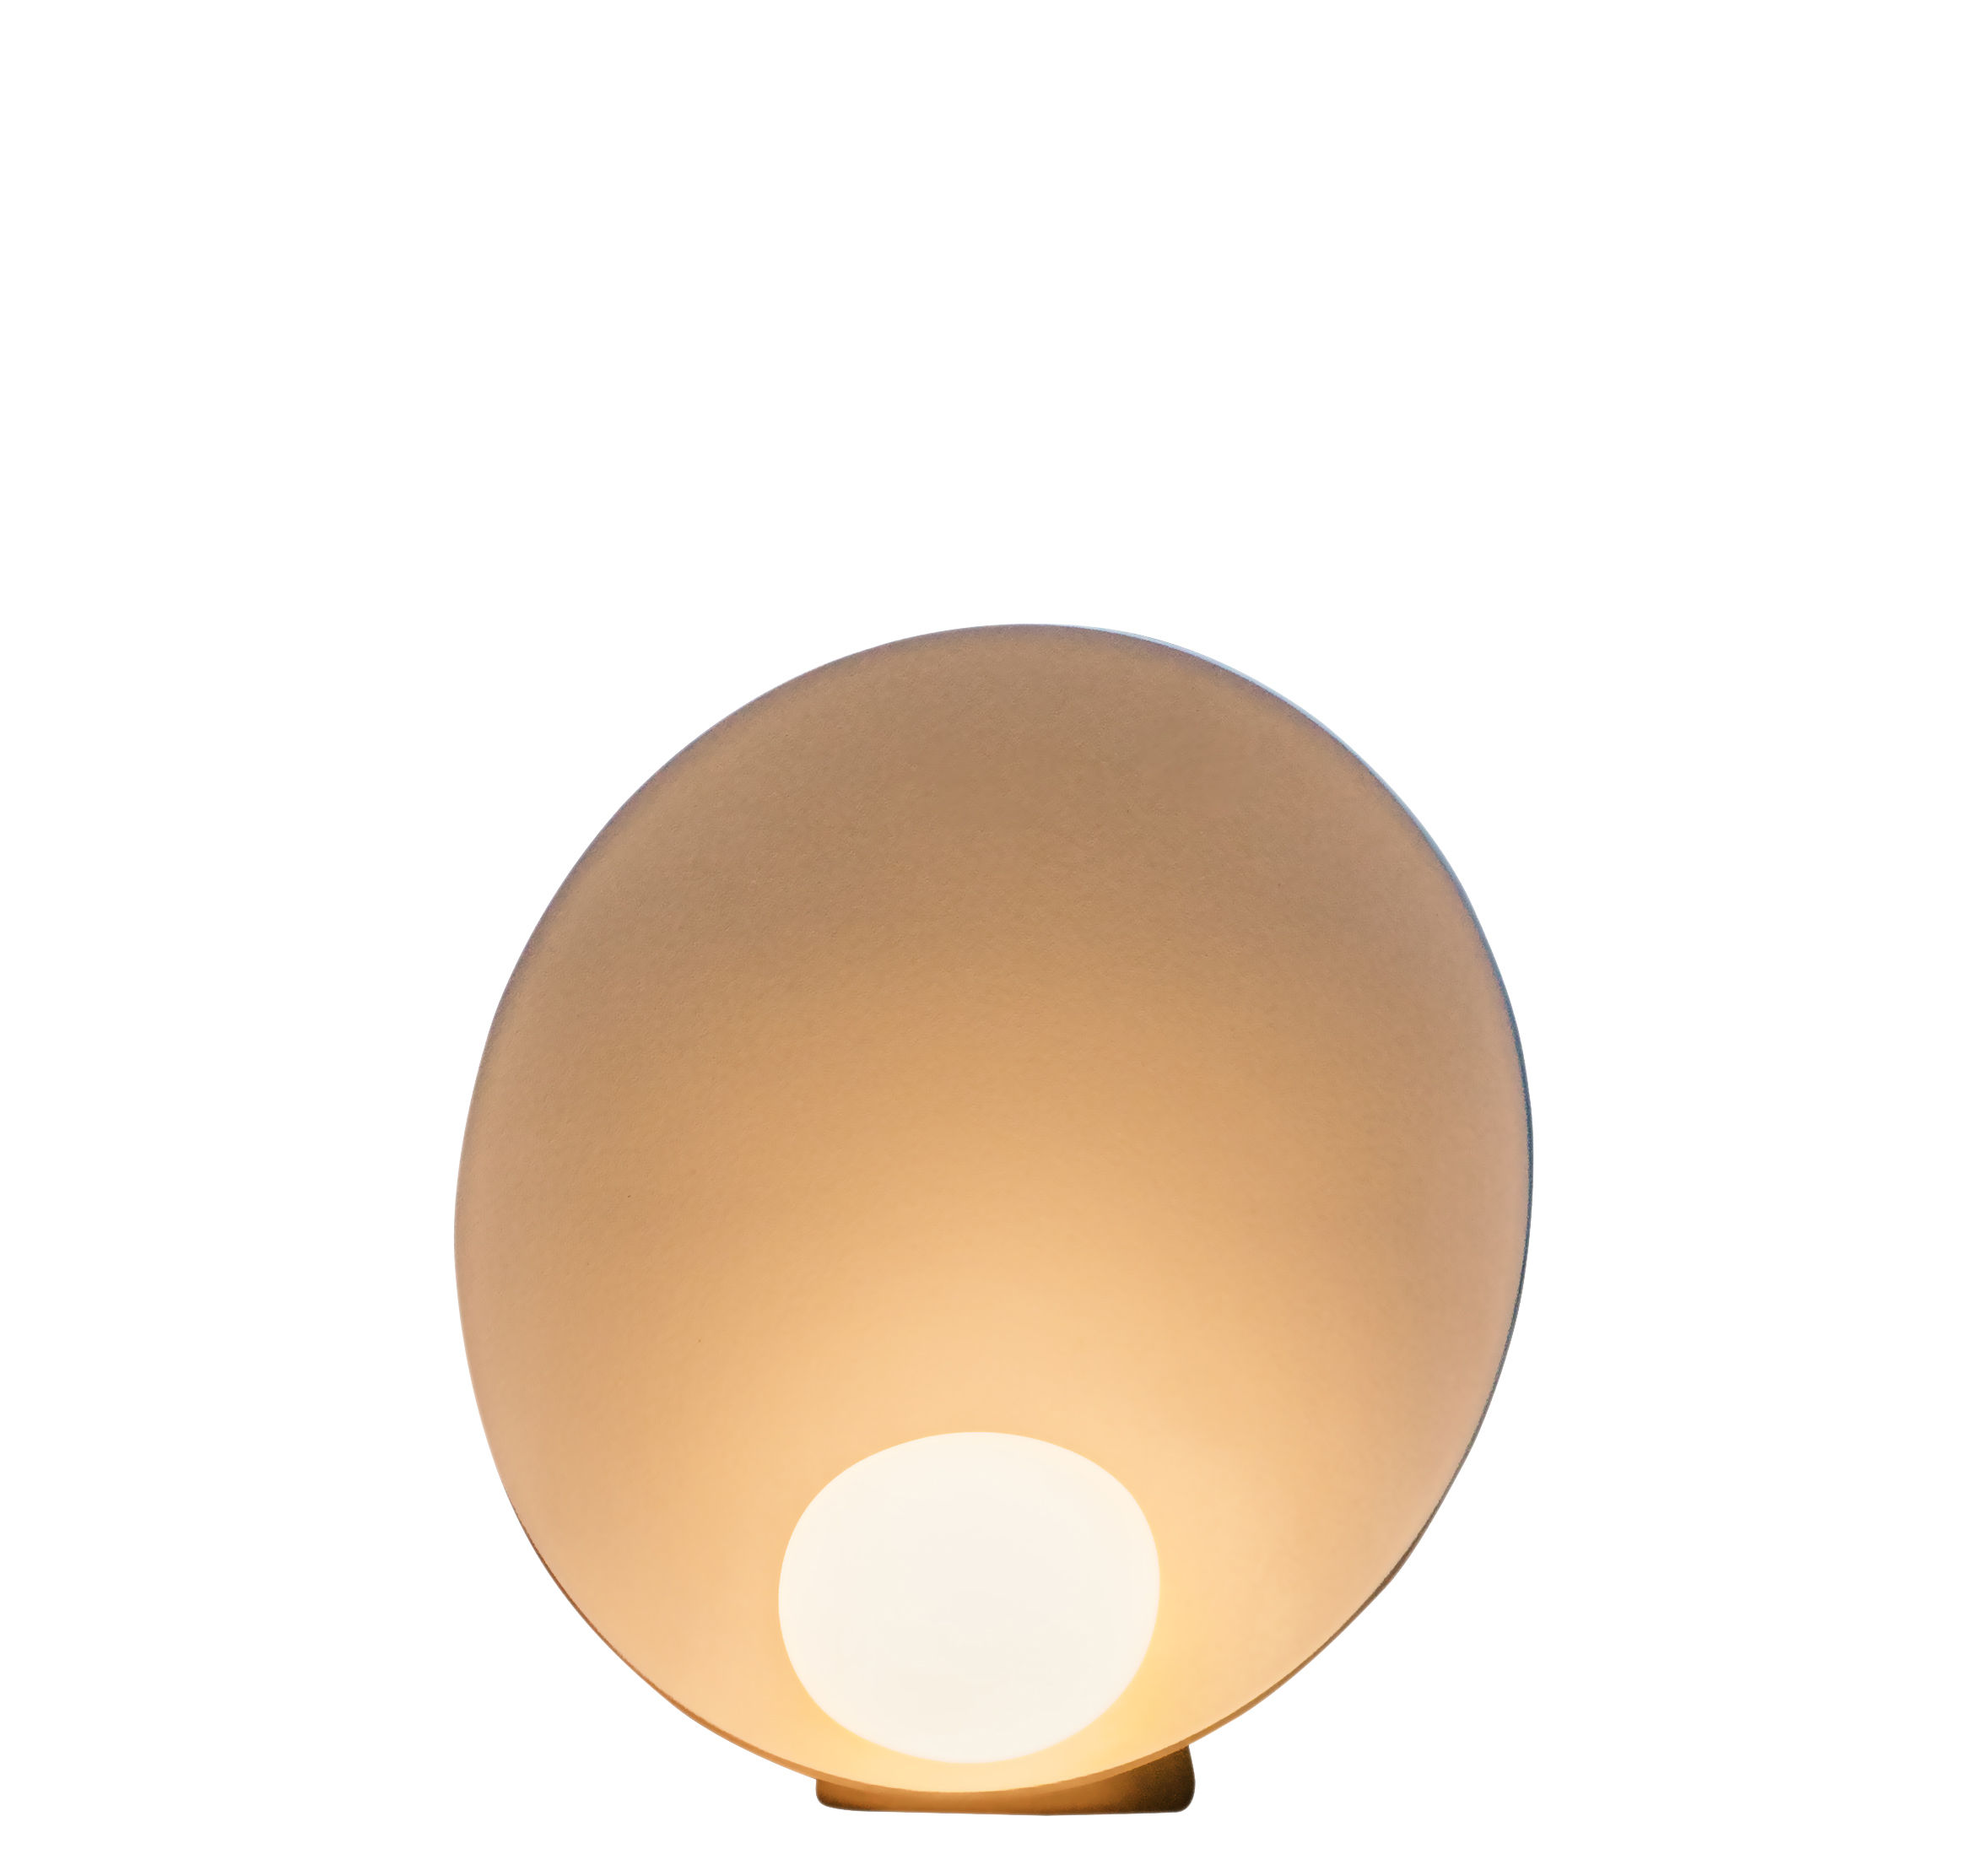 Lighting - Table Lamps - Musa Table lamp - / Version droite - Ø 26 cm by Vibia - Laqué saumon mat - Aluminium, Opalin mouth blown glass